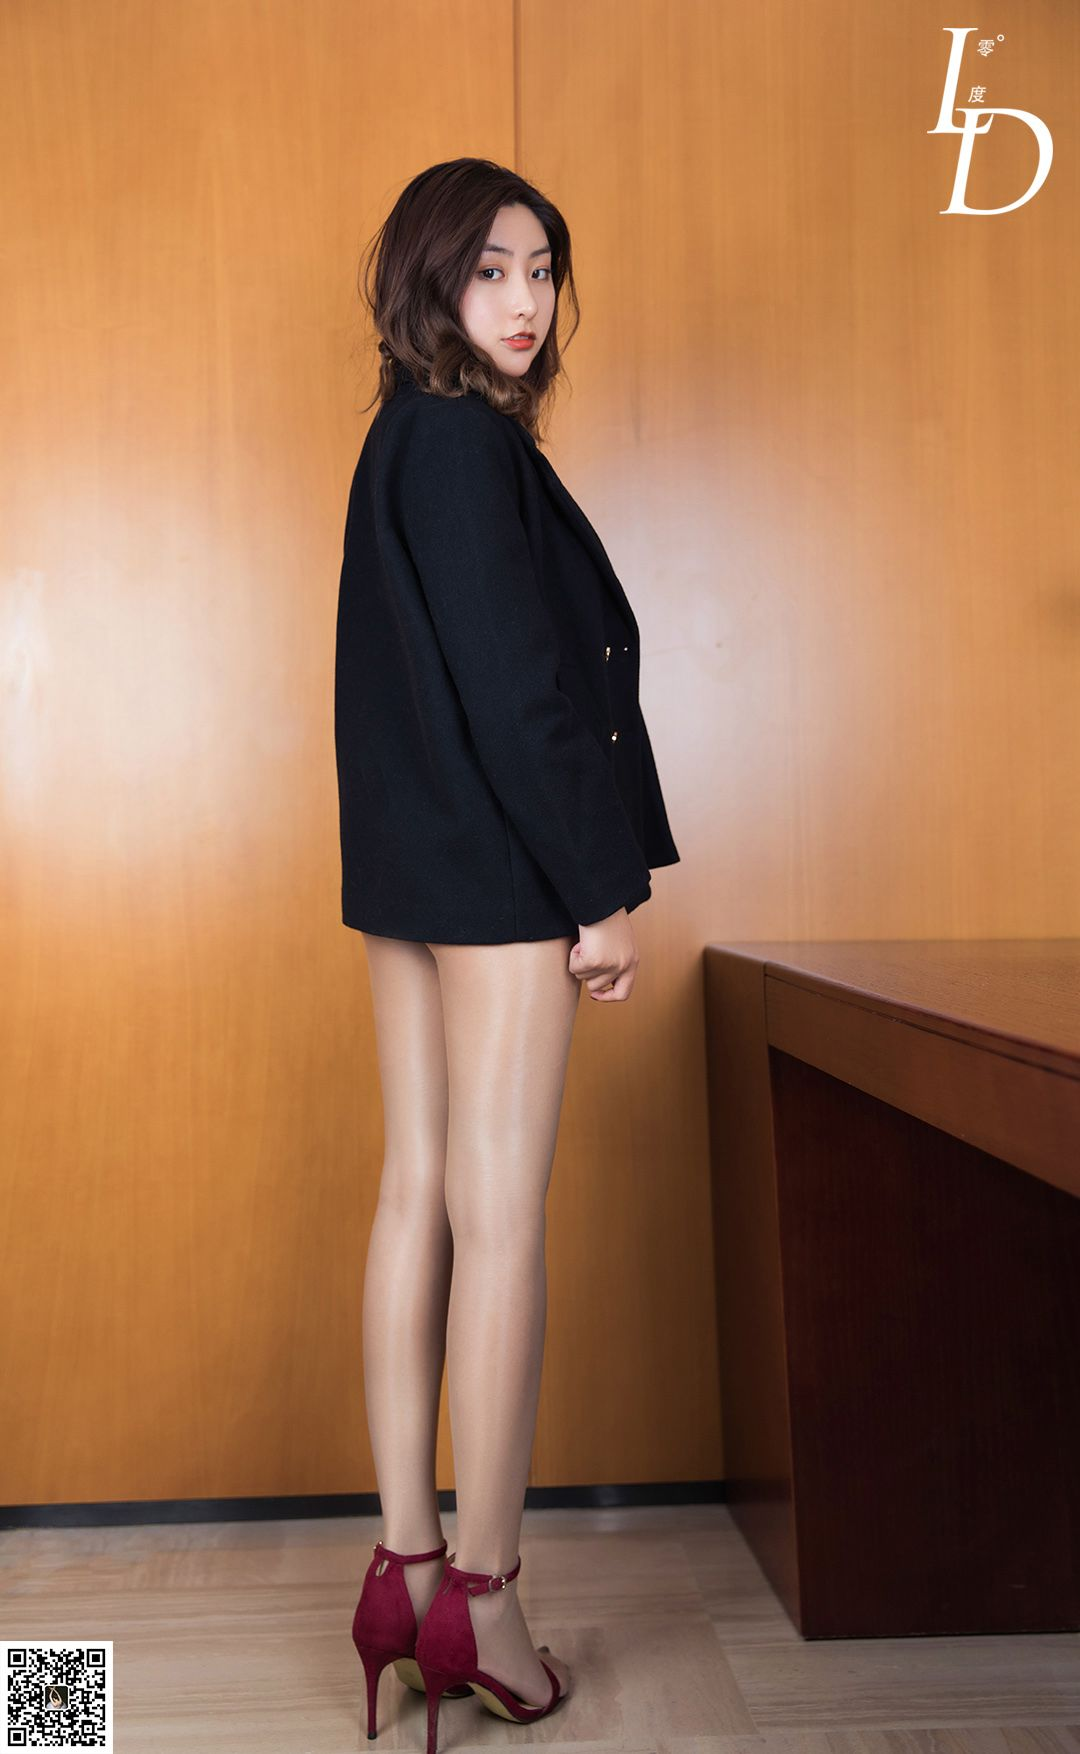 VOL.1637 [LD零度]肉丝袜丝袜少妇:甜甜高品质写真套图(65P)